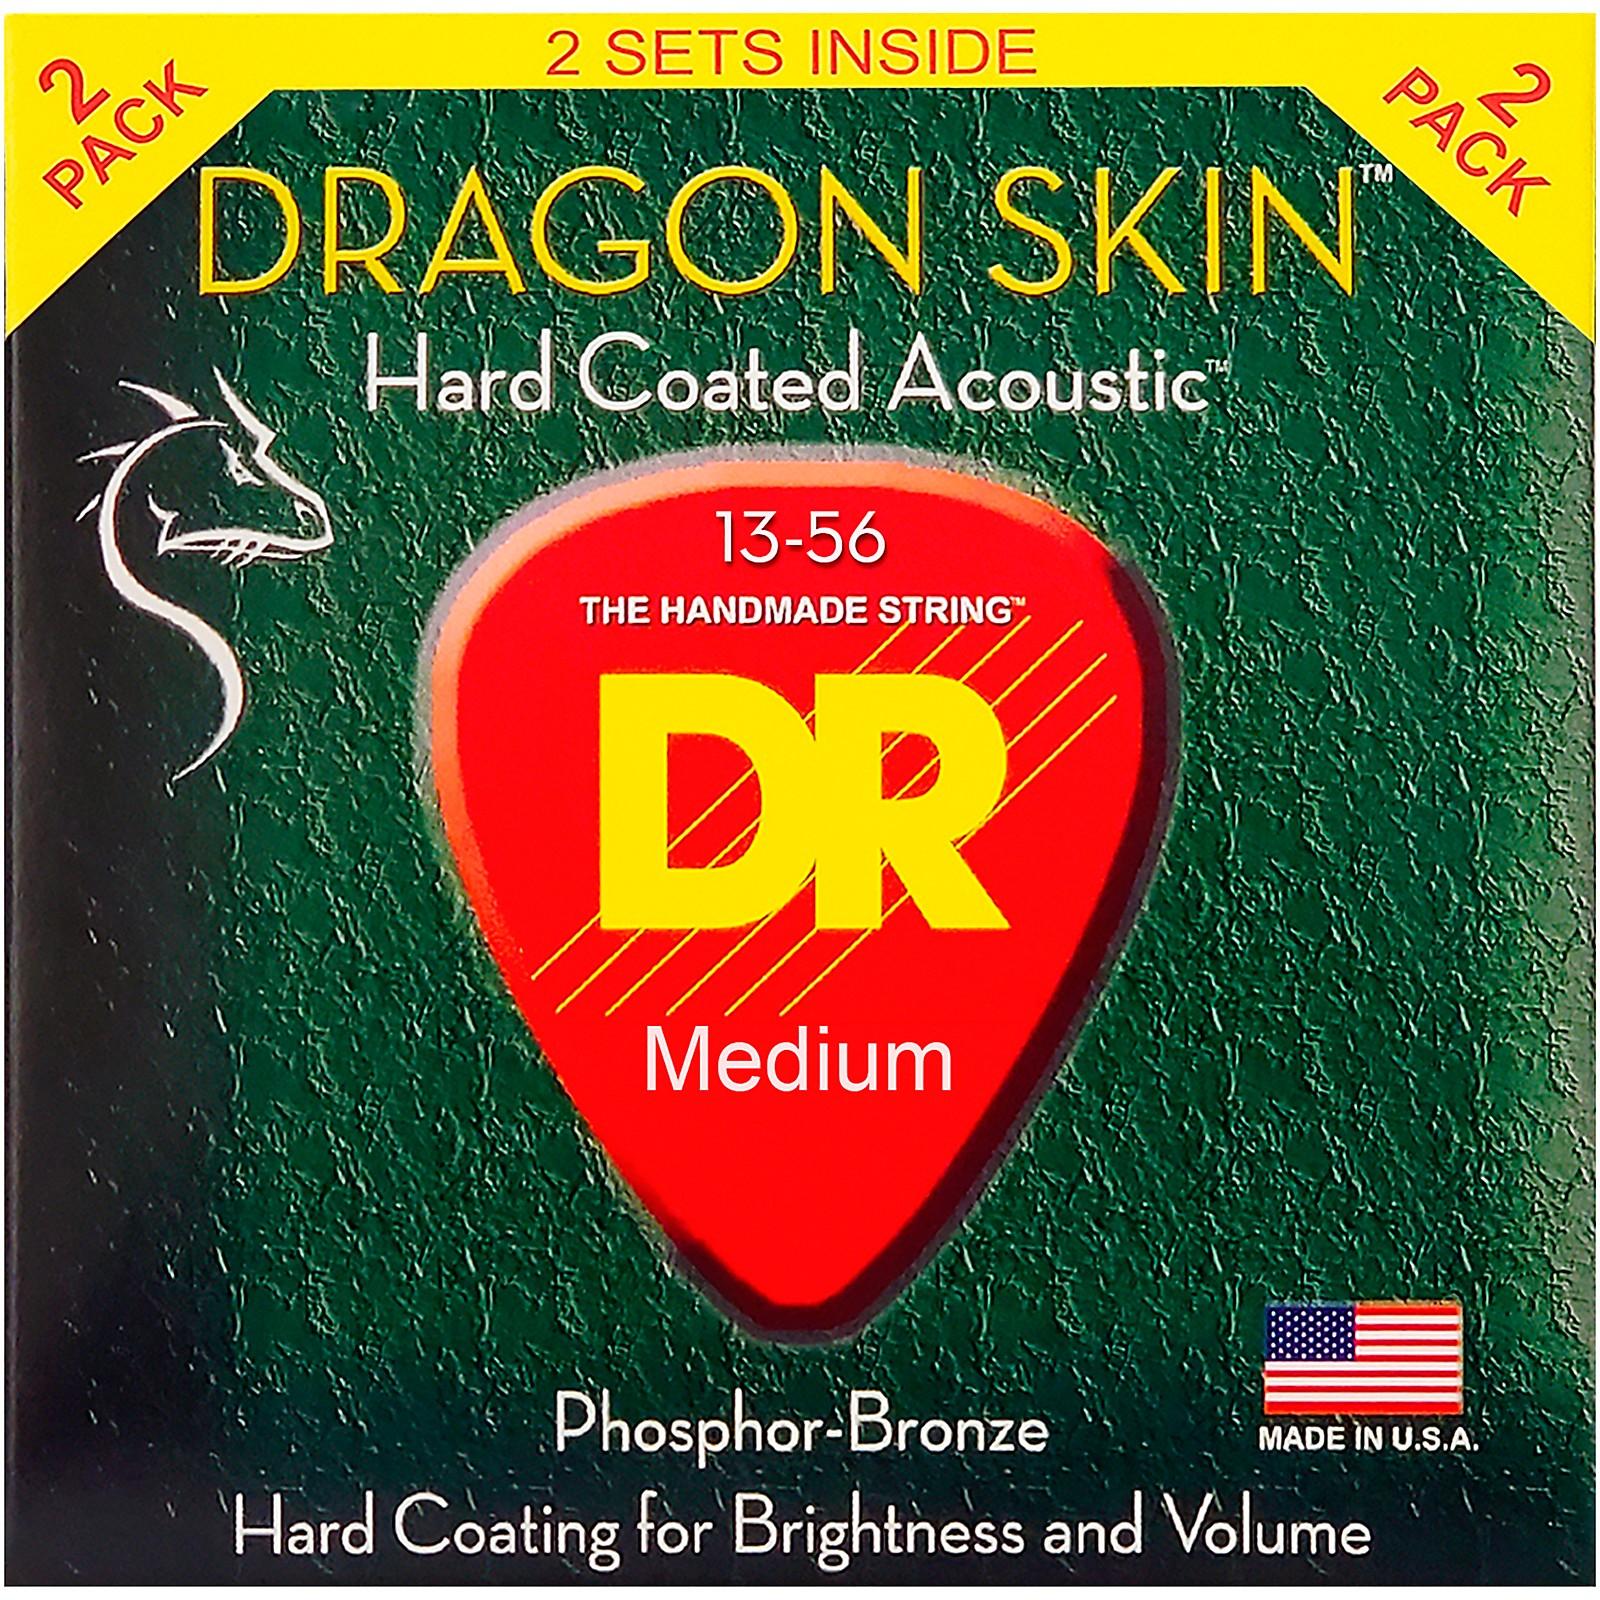 DR Strings Dragon Skin Clear Coated Phosphor Bronze Heavy Acoustic Guitar Strings (13-56) 2 Pack